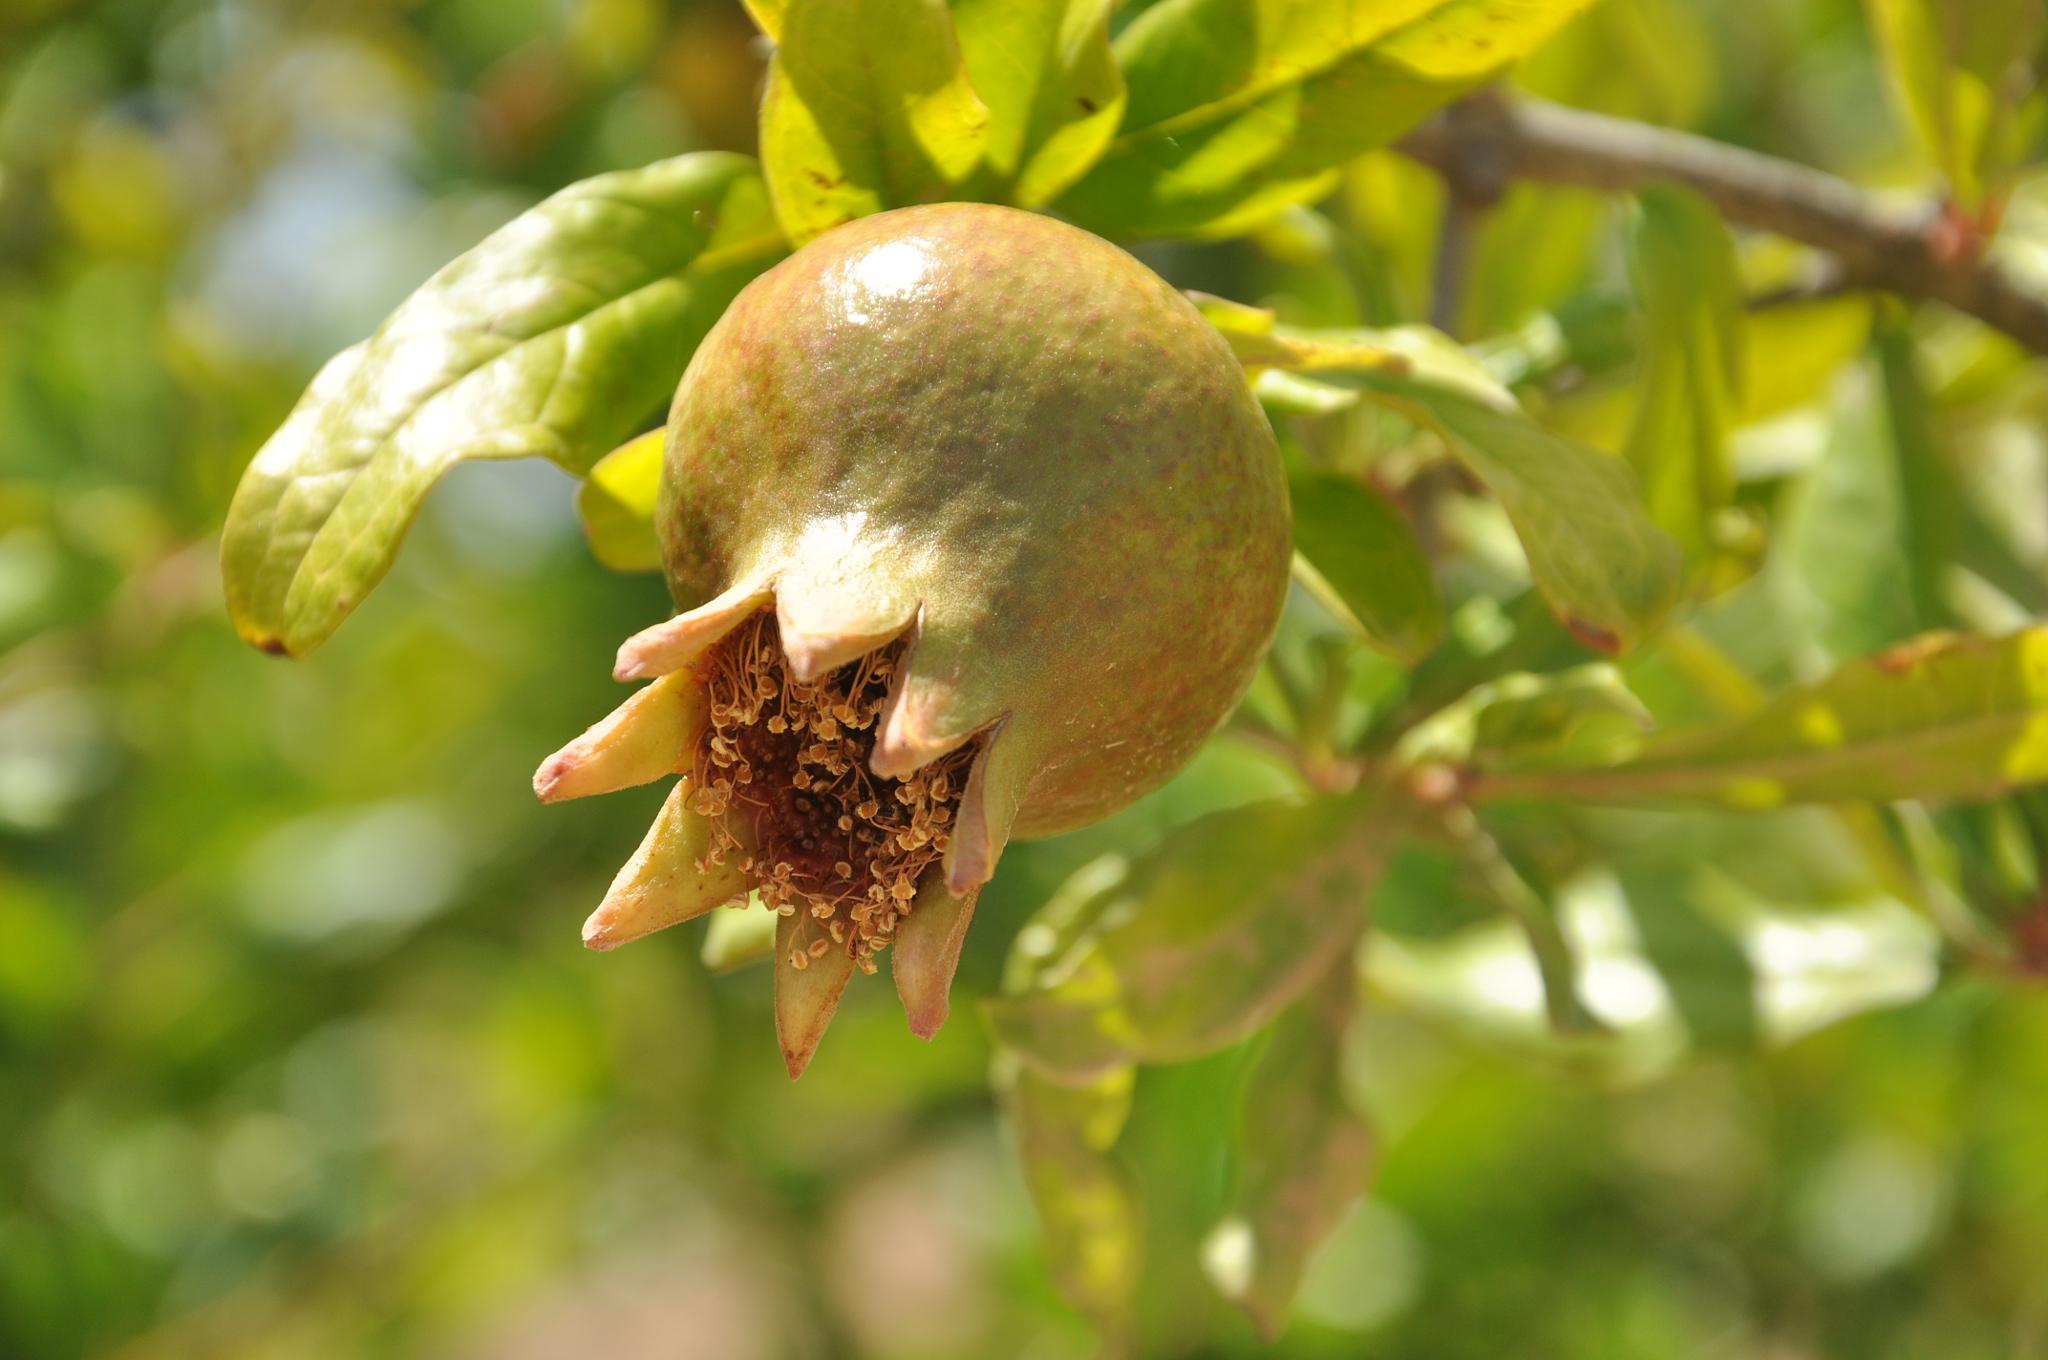 Pomegranate by Anna Pronenko